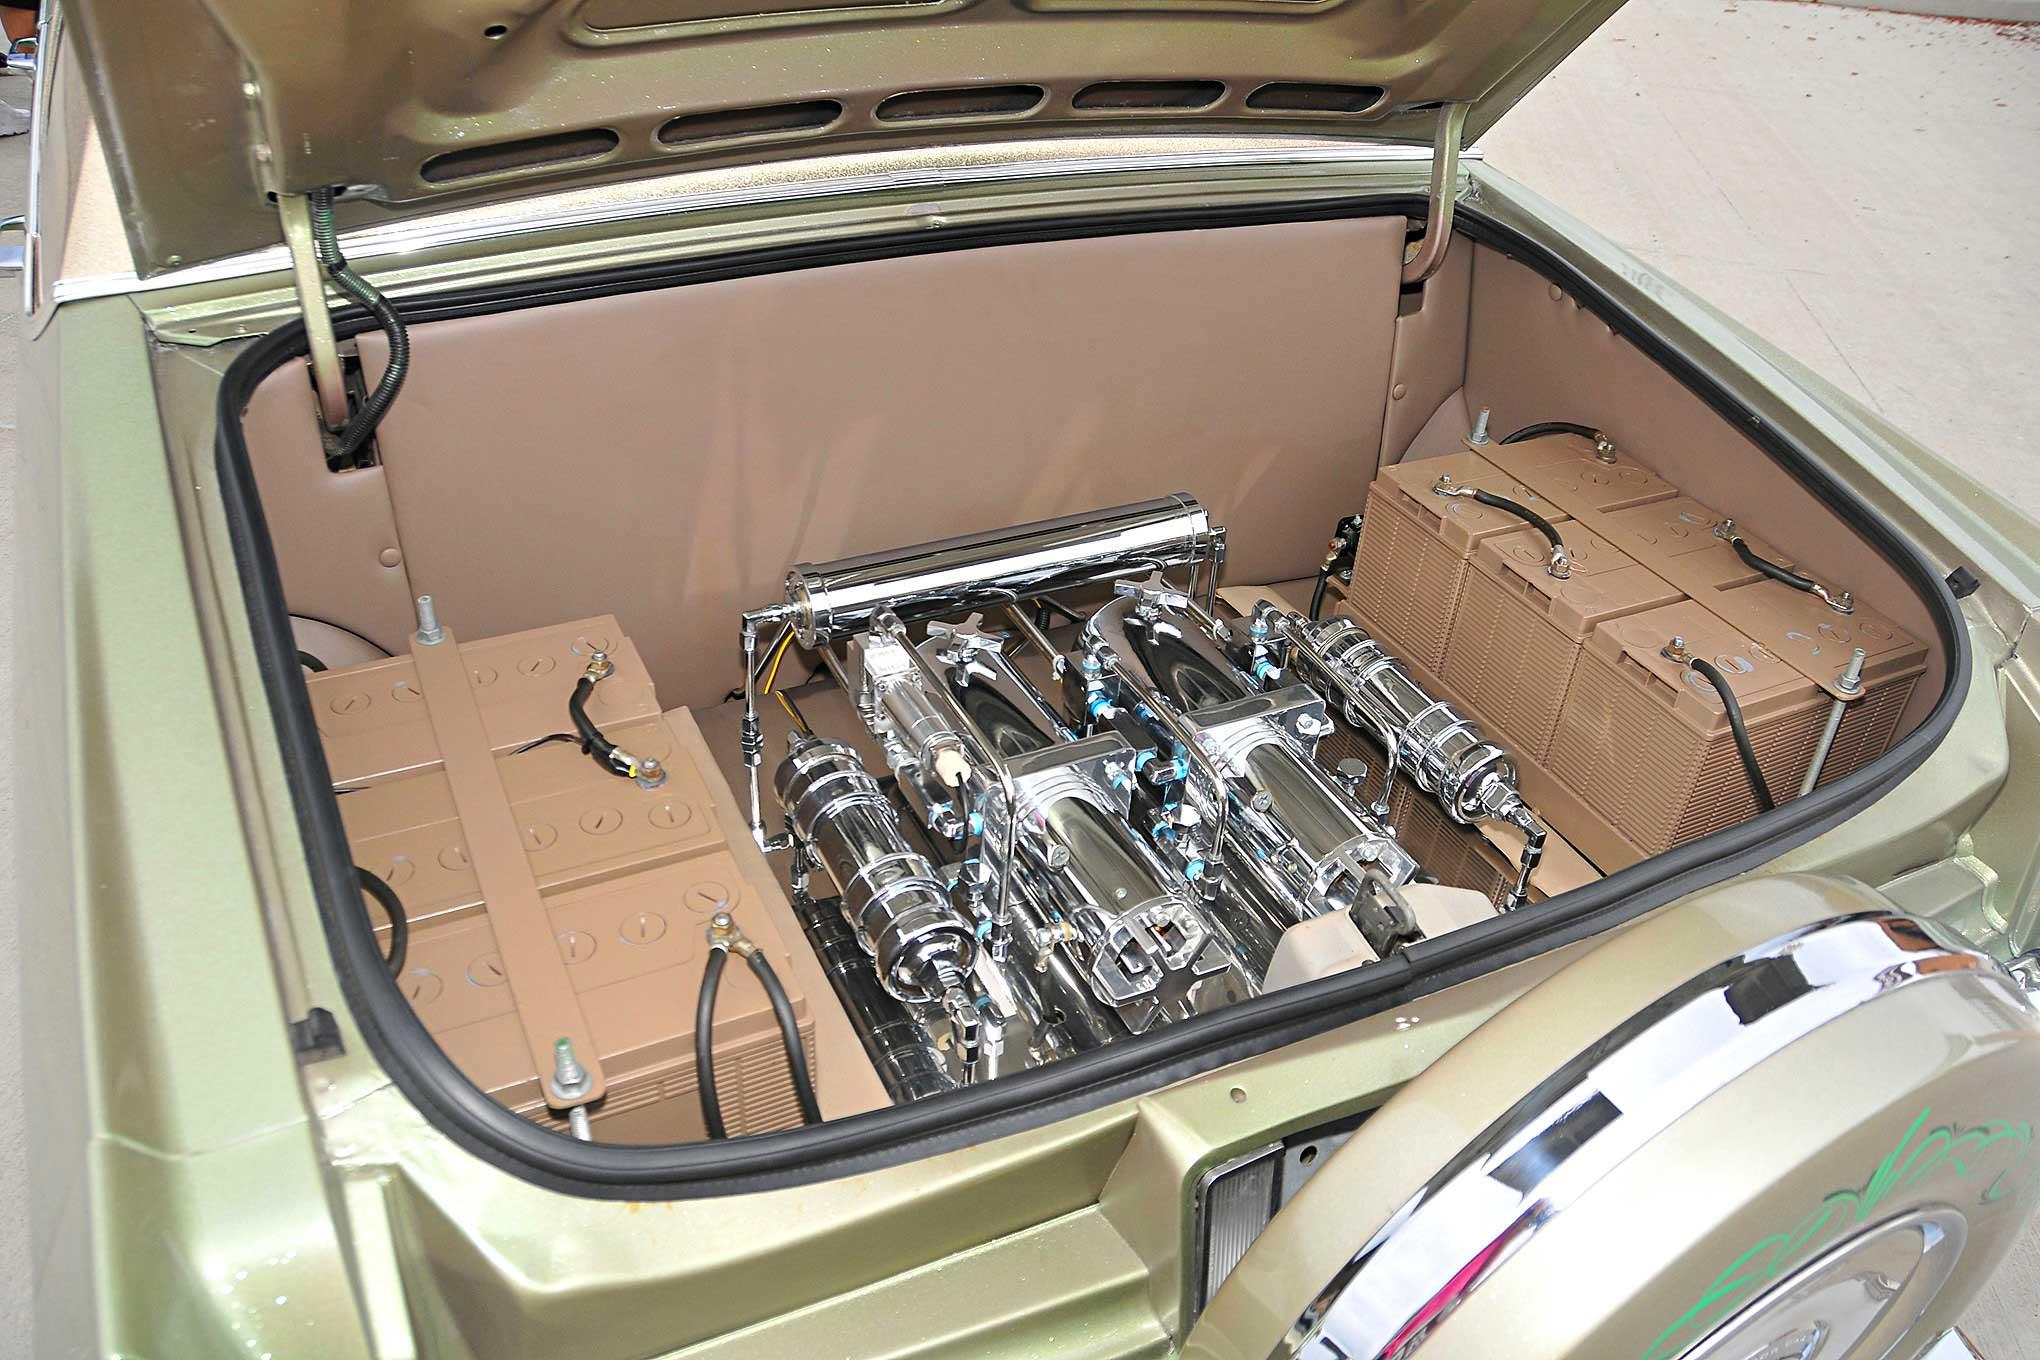 1990 Cadillac Fleetwood Brougham Hoppos Hydraulics Setup